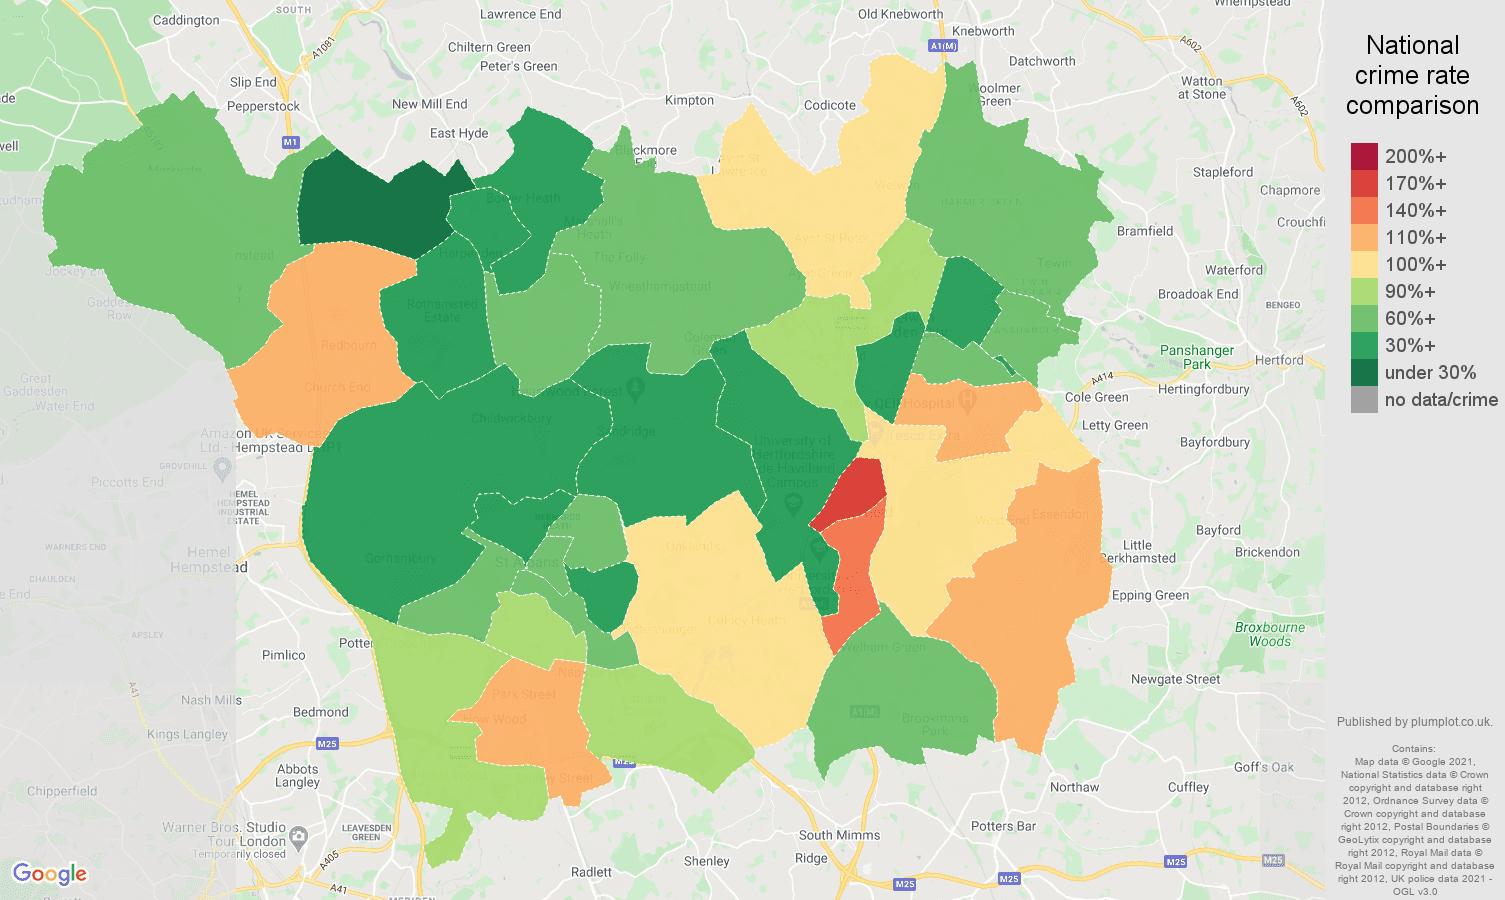 St Albans burglary crime rate comparison map